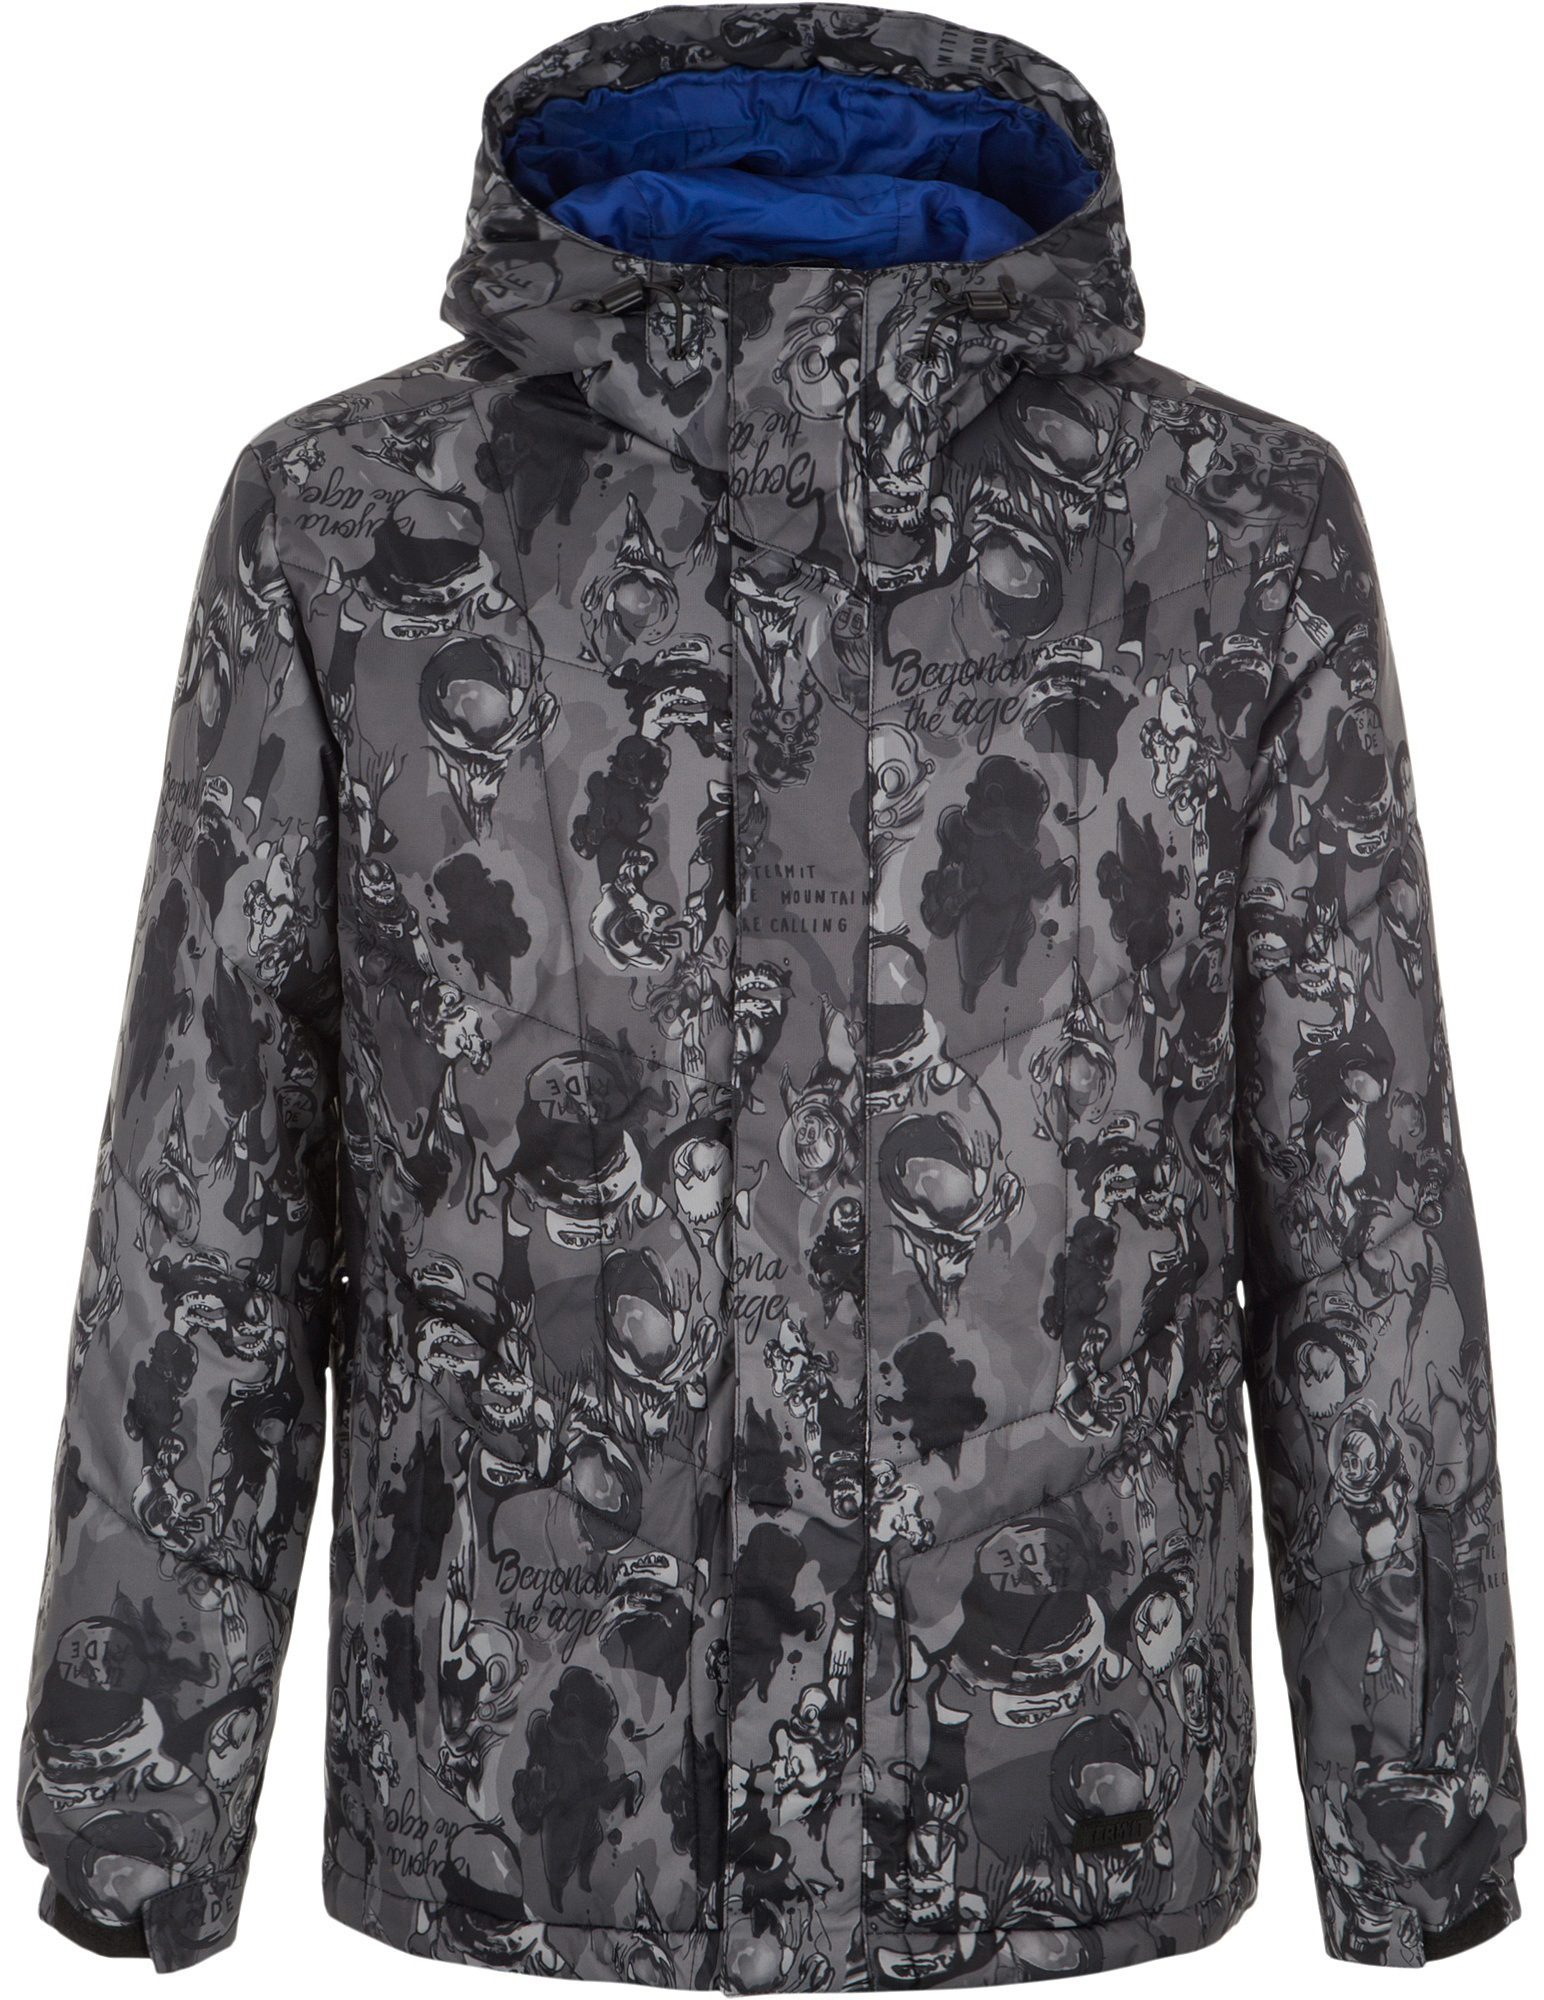 Termit Куртка утепленная мужская Termit yisen куртка мужская осенняя